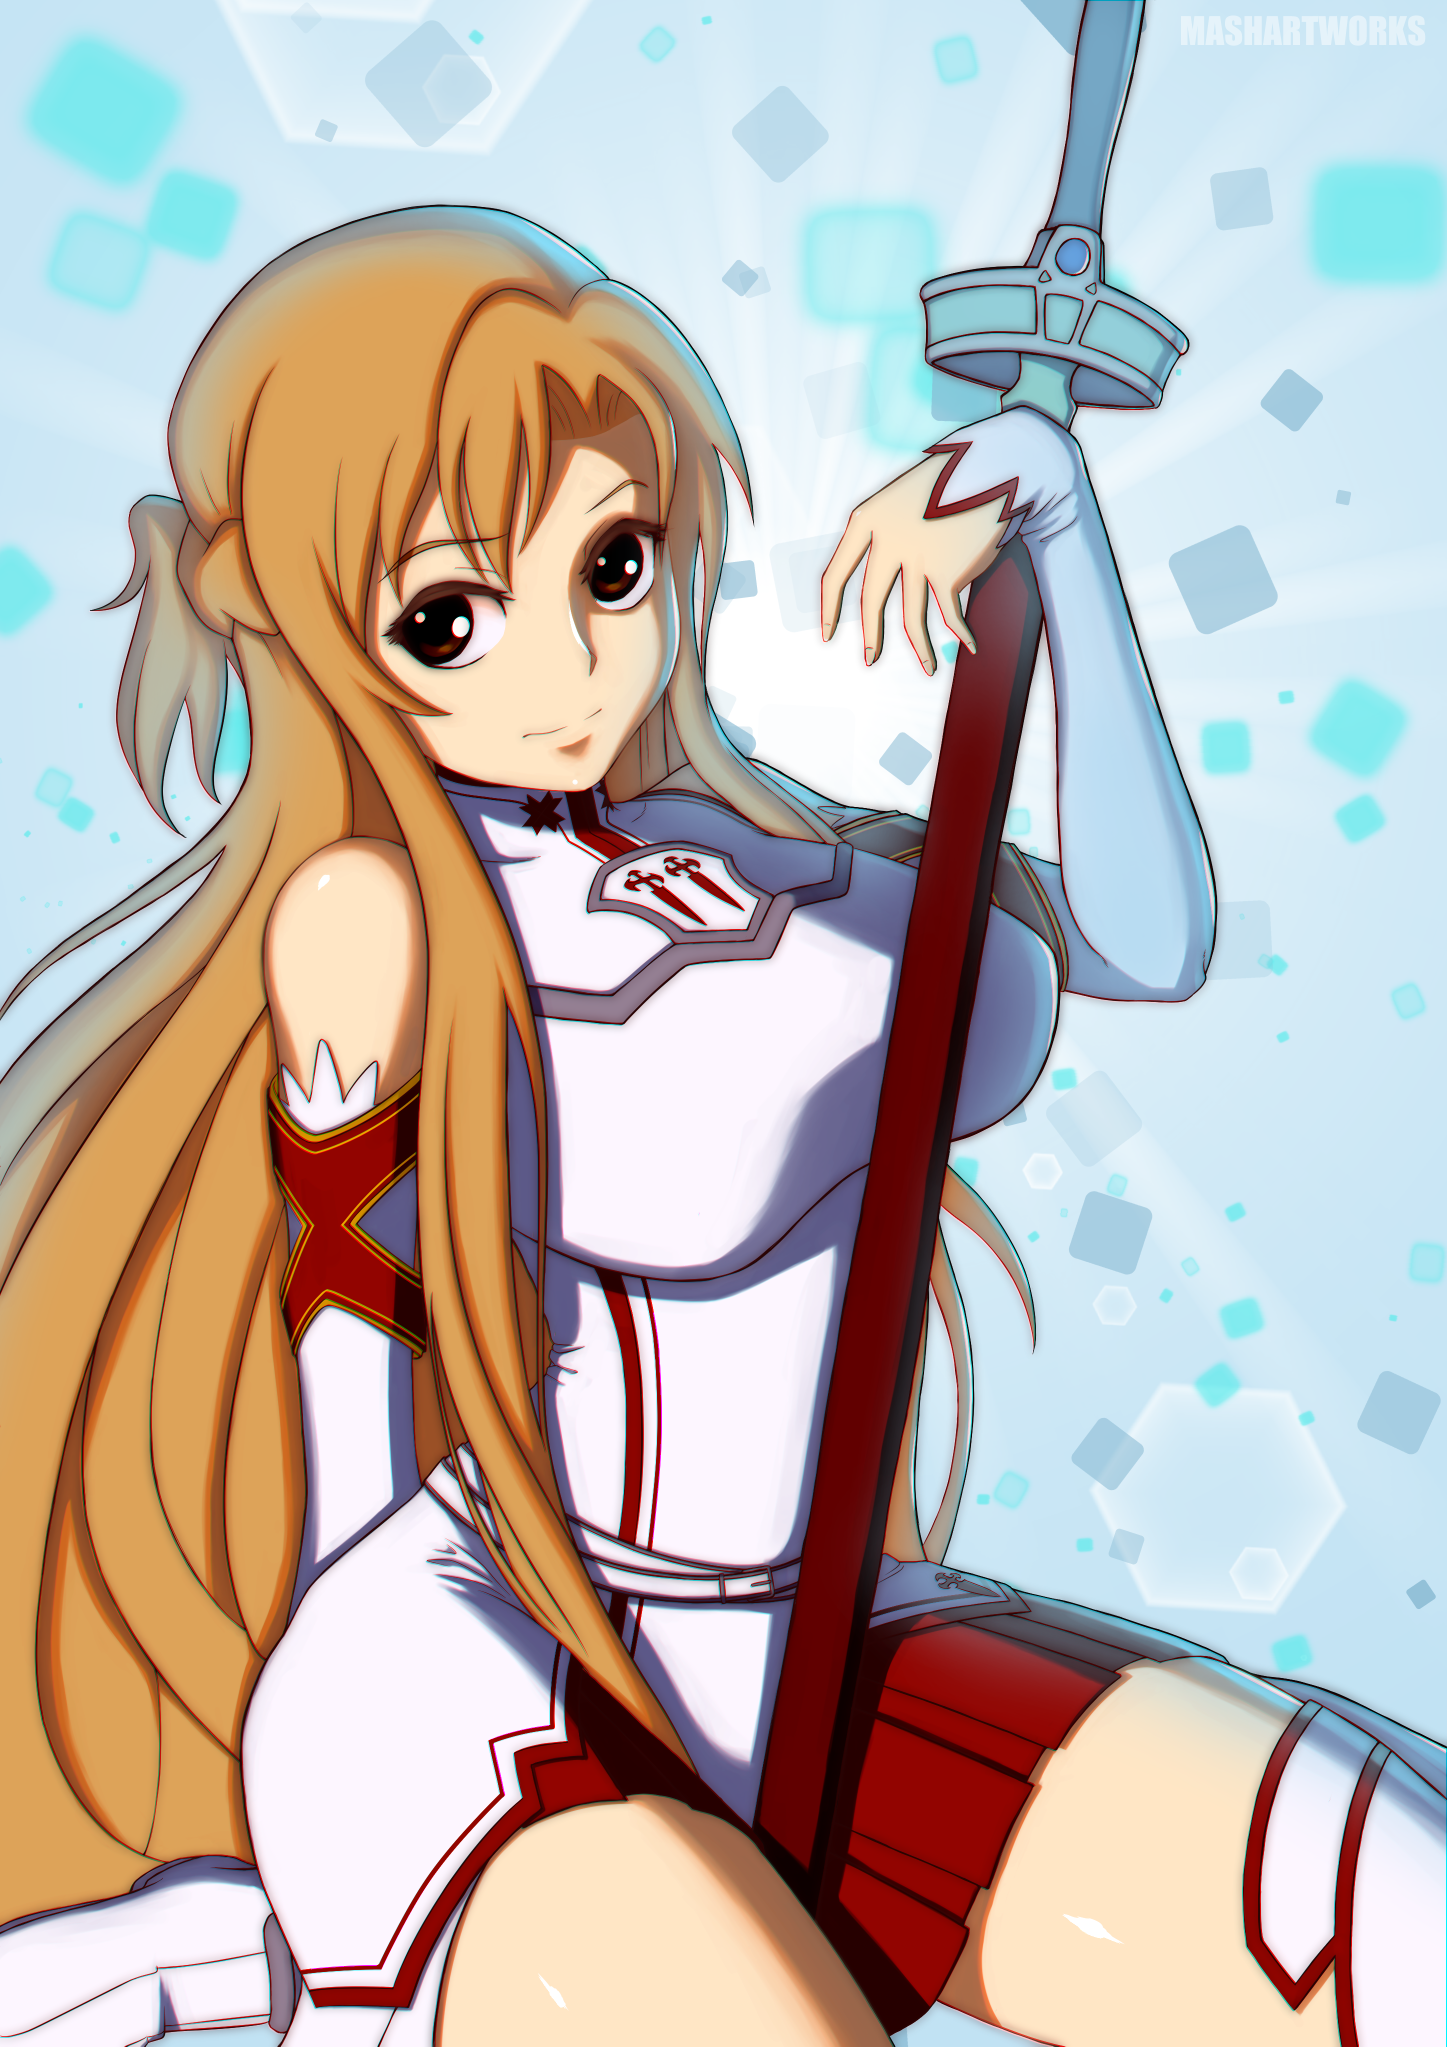 Sword Art Online - Asuna by MadRaccoon on Newgrounds